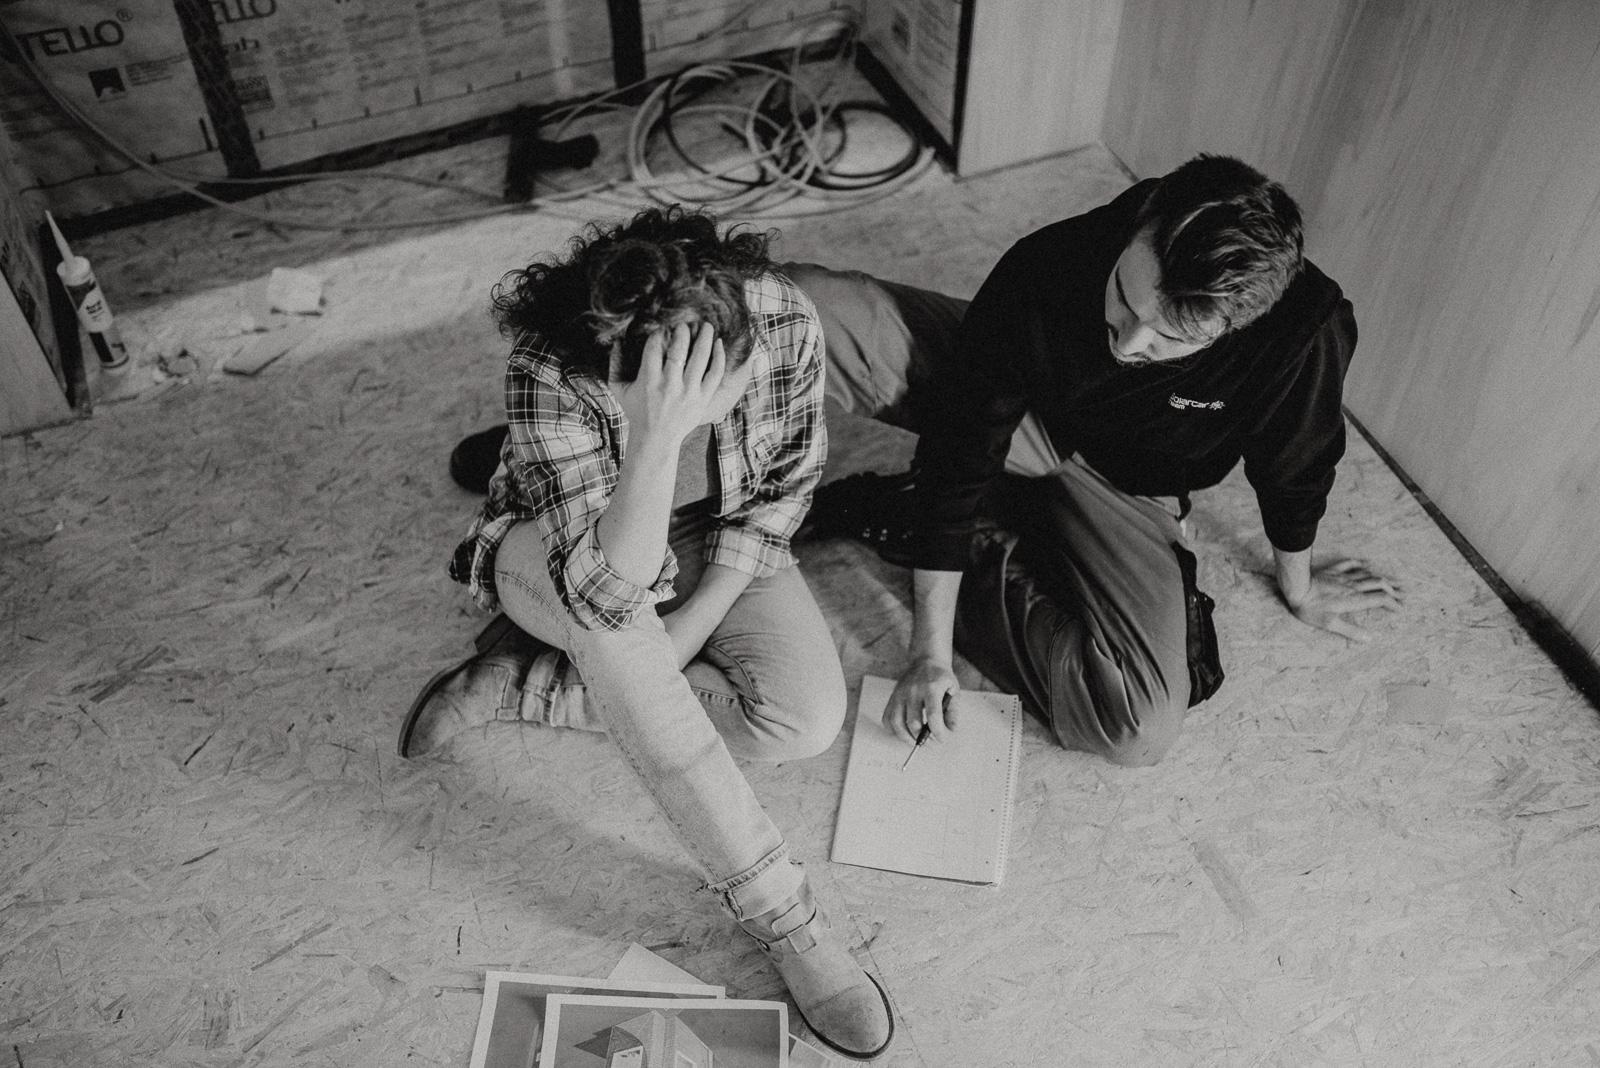 028-dokumentarische-fotografie-tinyhouse-ecochalet-fotografin-witten